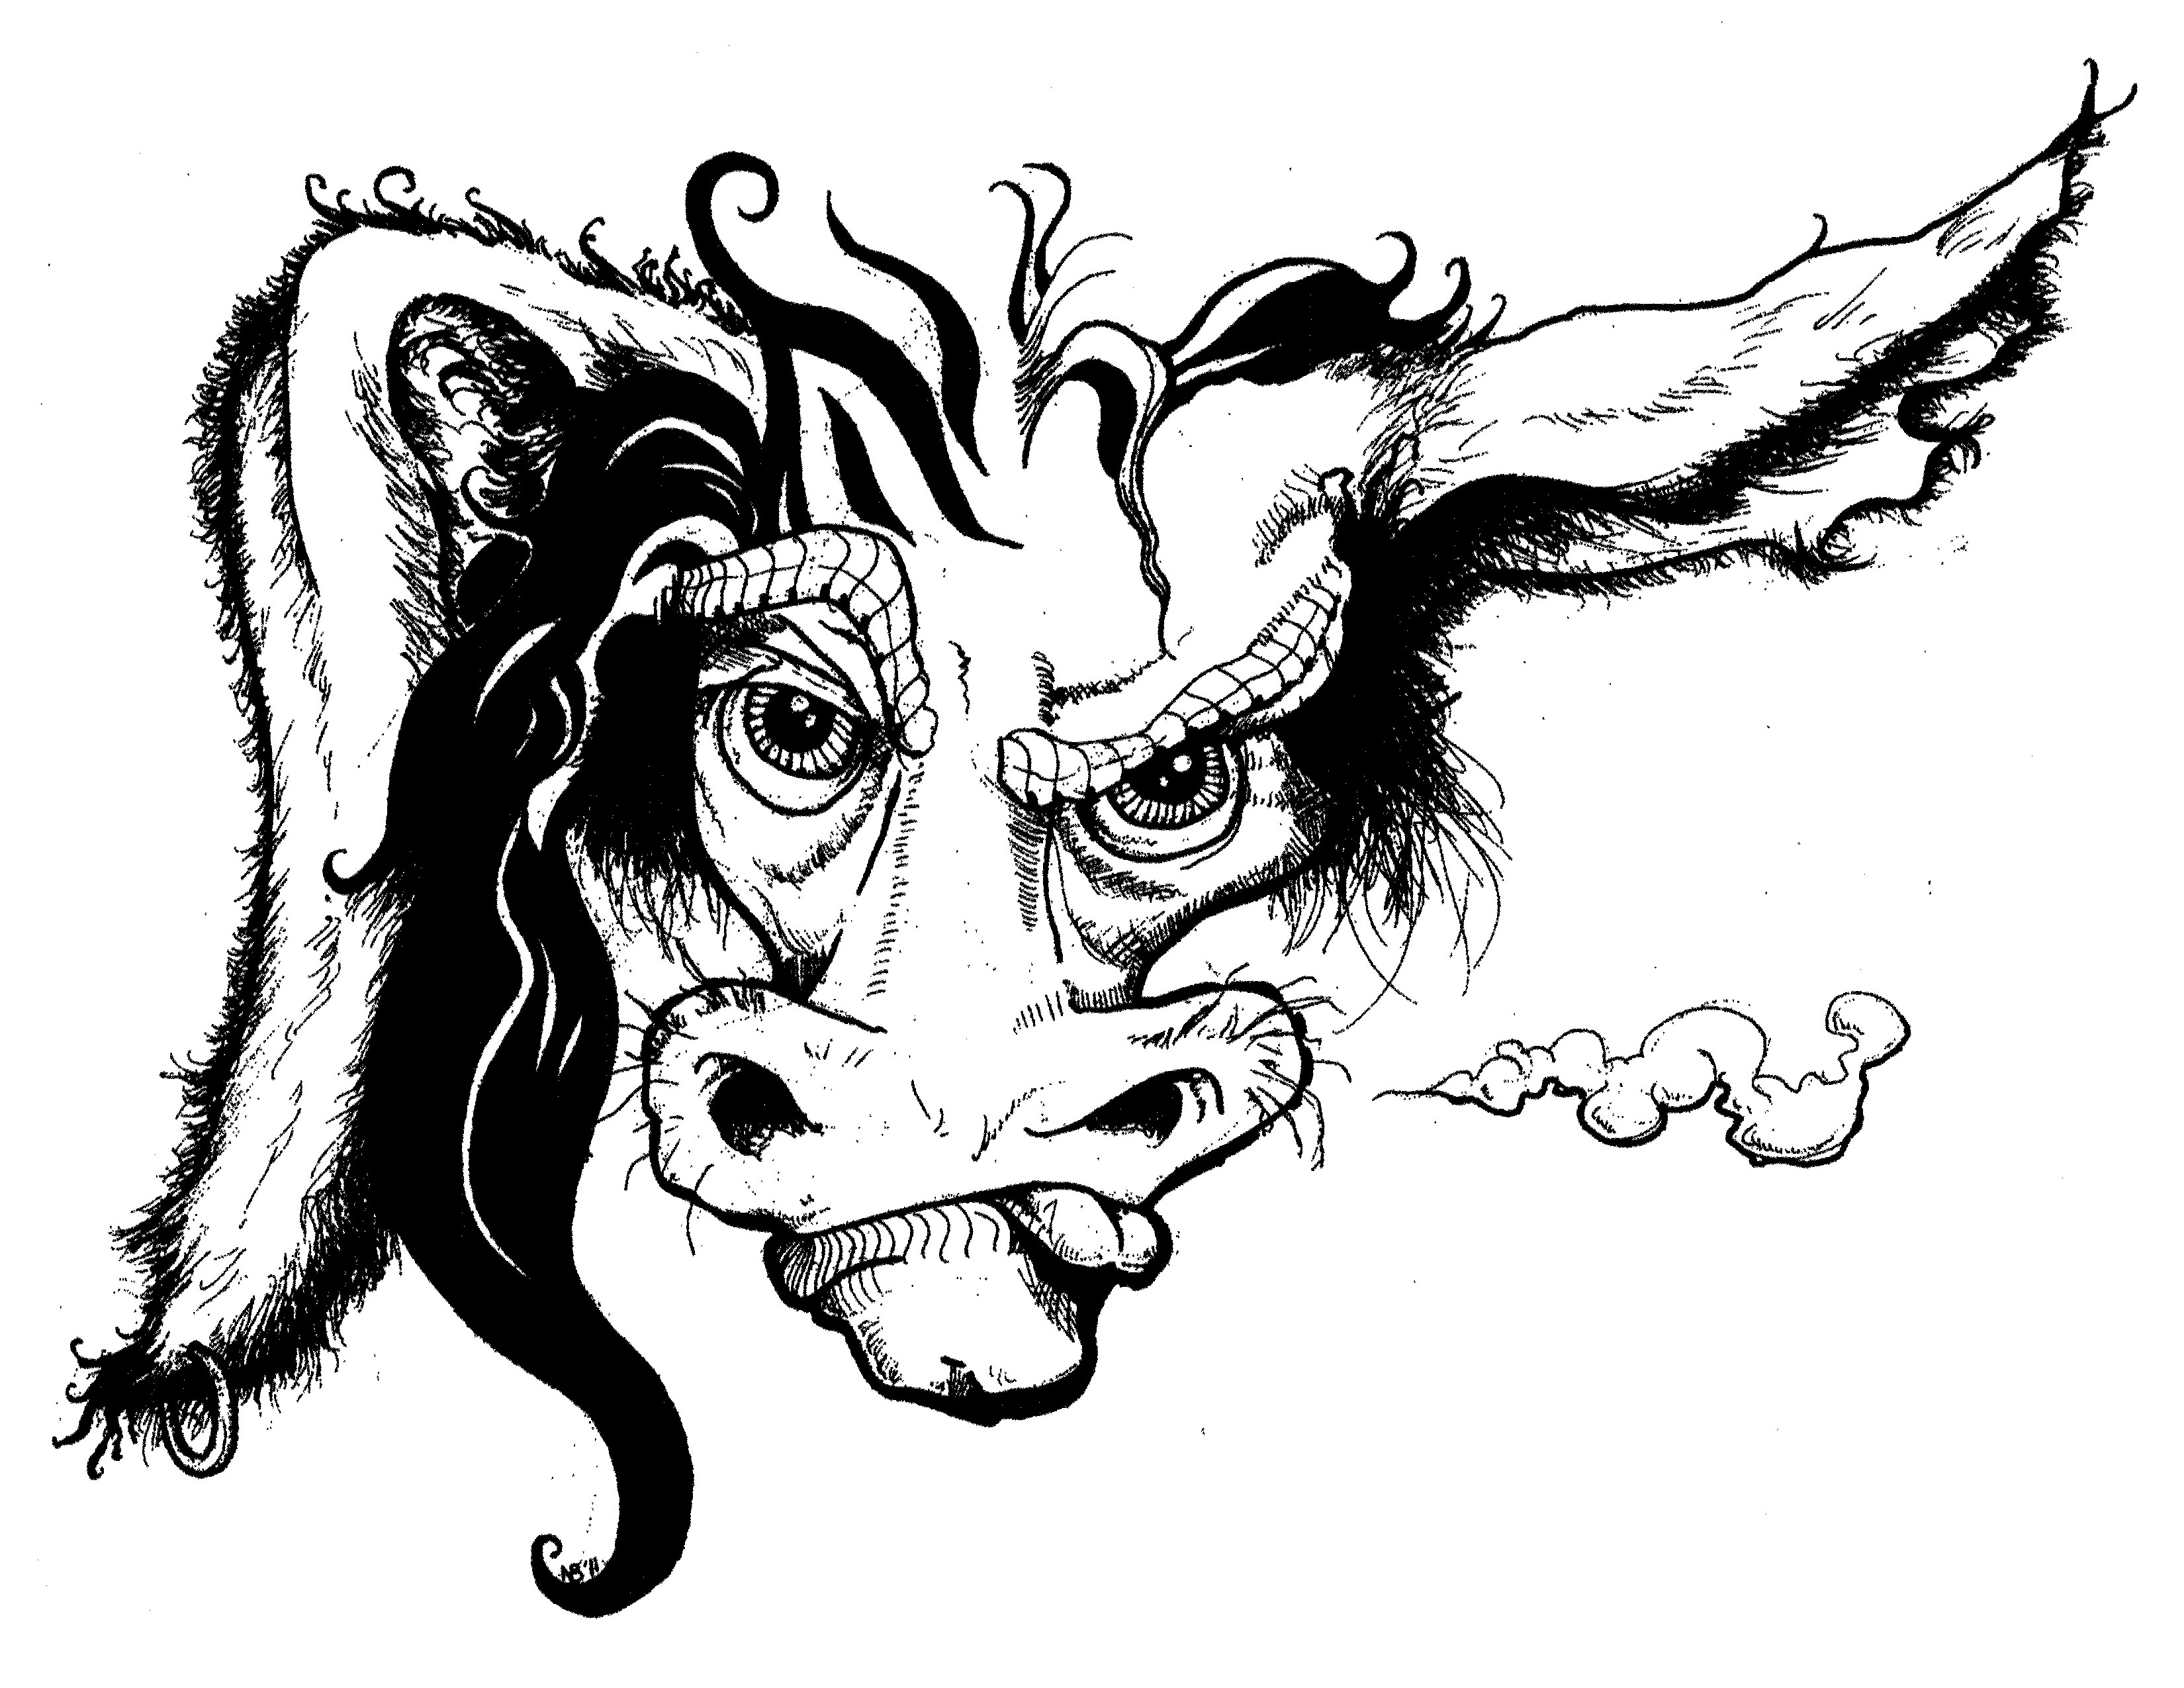 3300x2550 Cool Badass Drawings Butterfly Angel Of Crosses Devil Cartoon